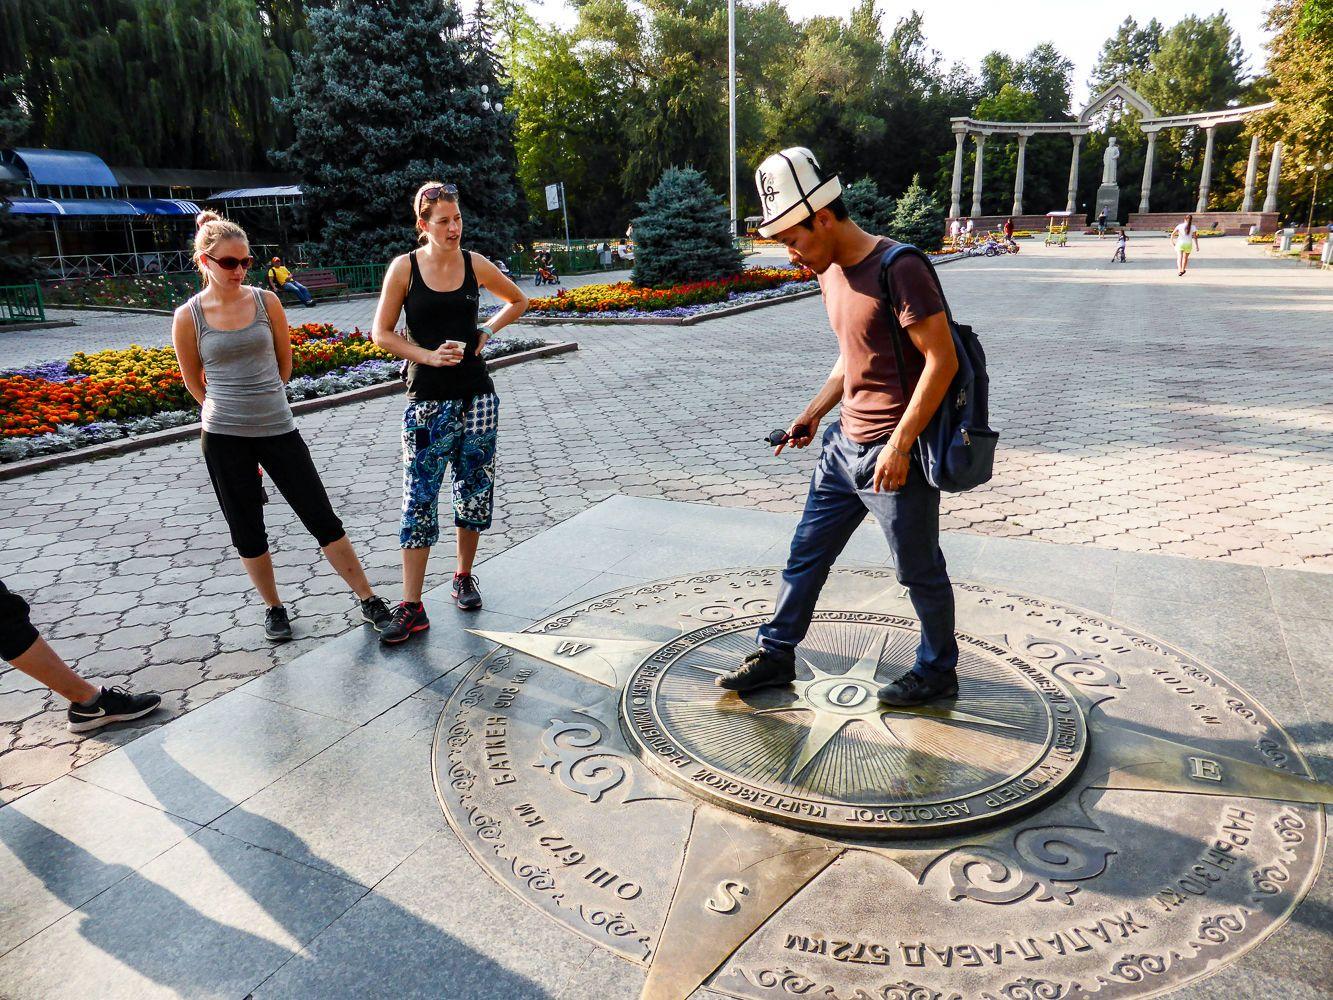 Guide in Kalpak hat telling about Kyrgyzstan in Bishkek city tour